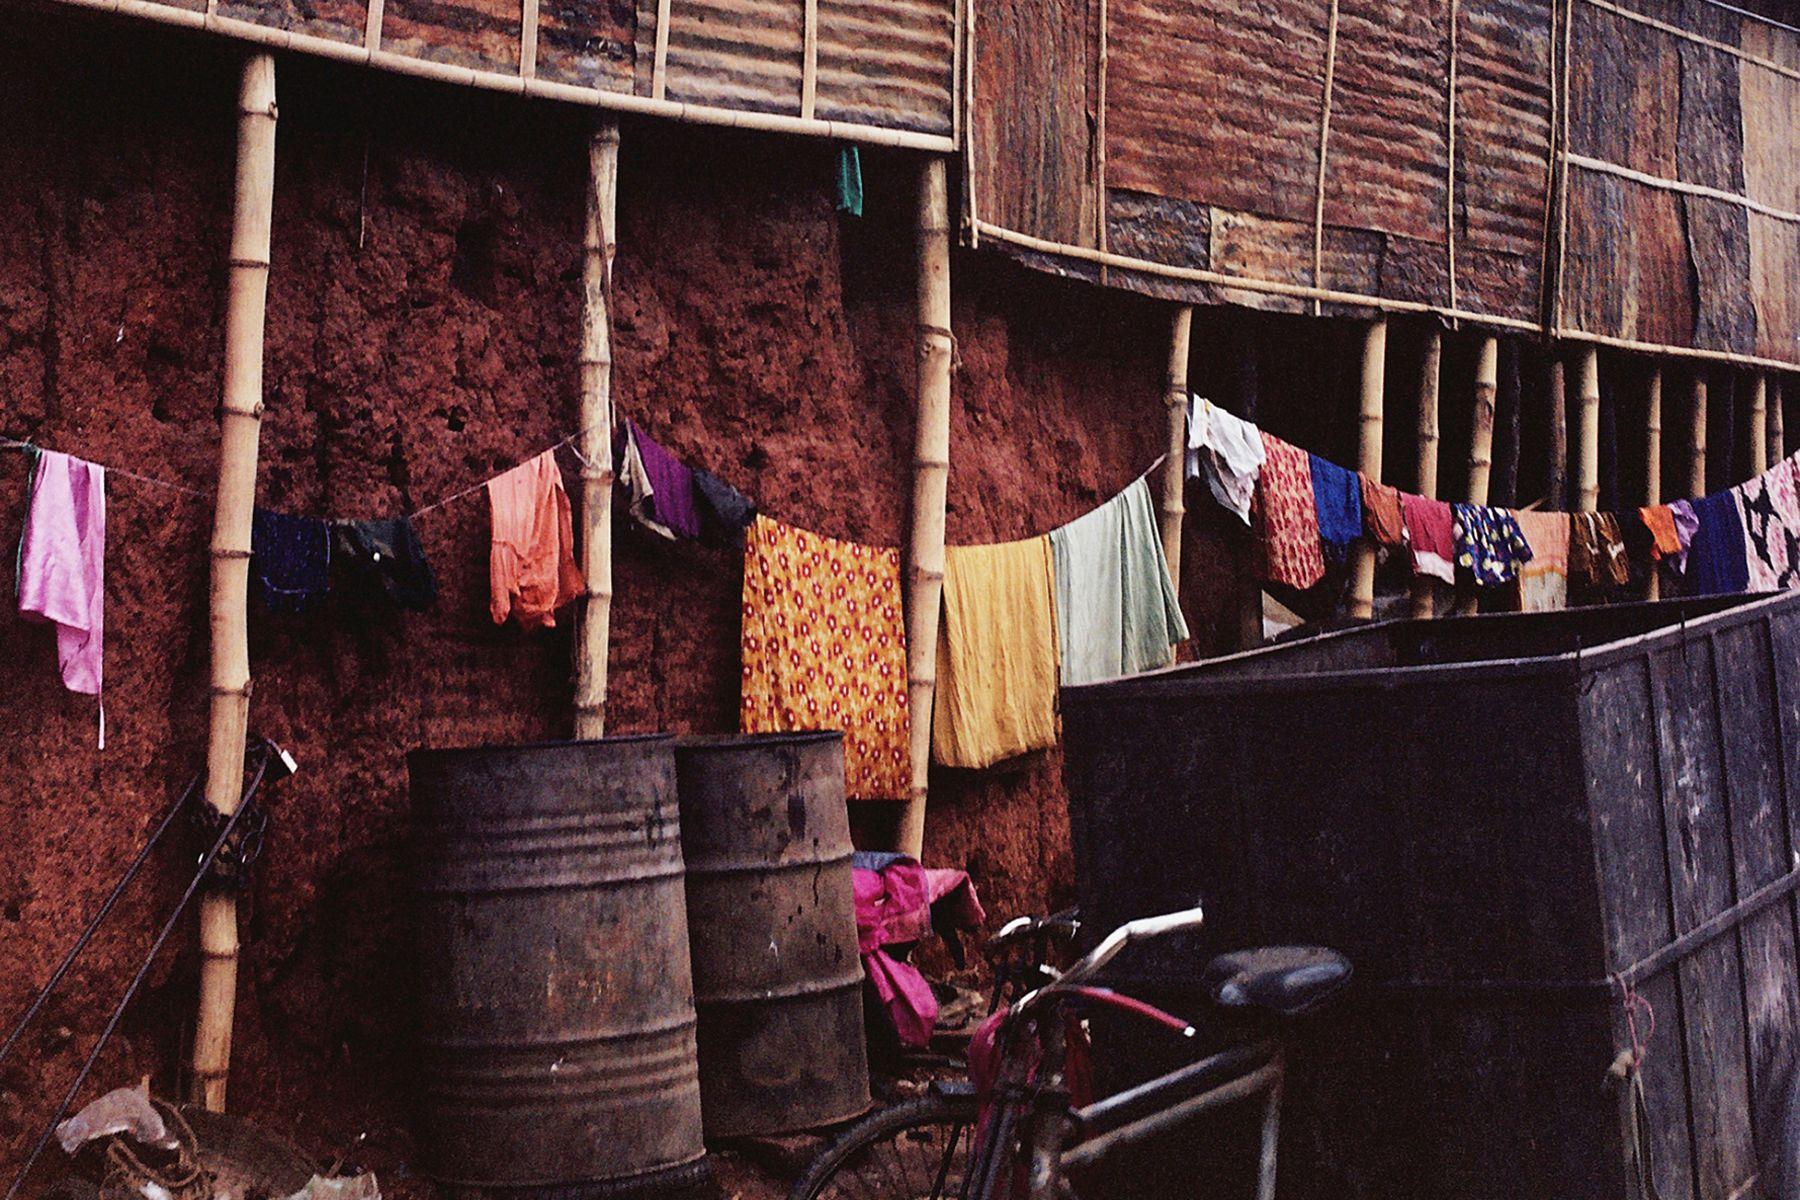 Washing day in Dhaka Bangladesh by Fiona Nicholson